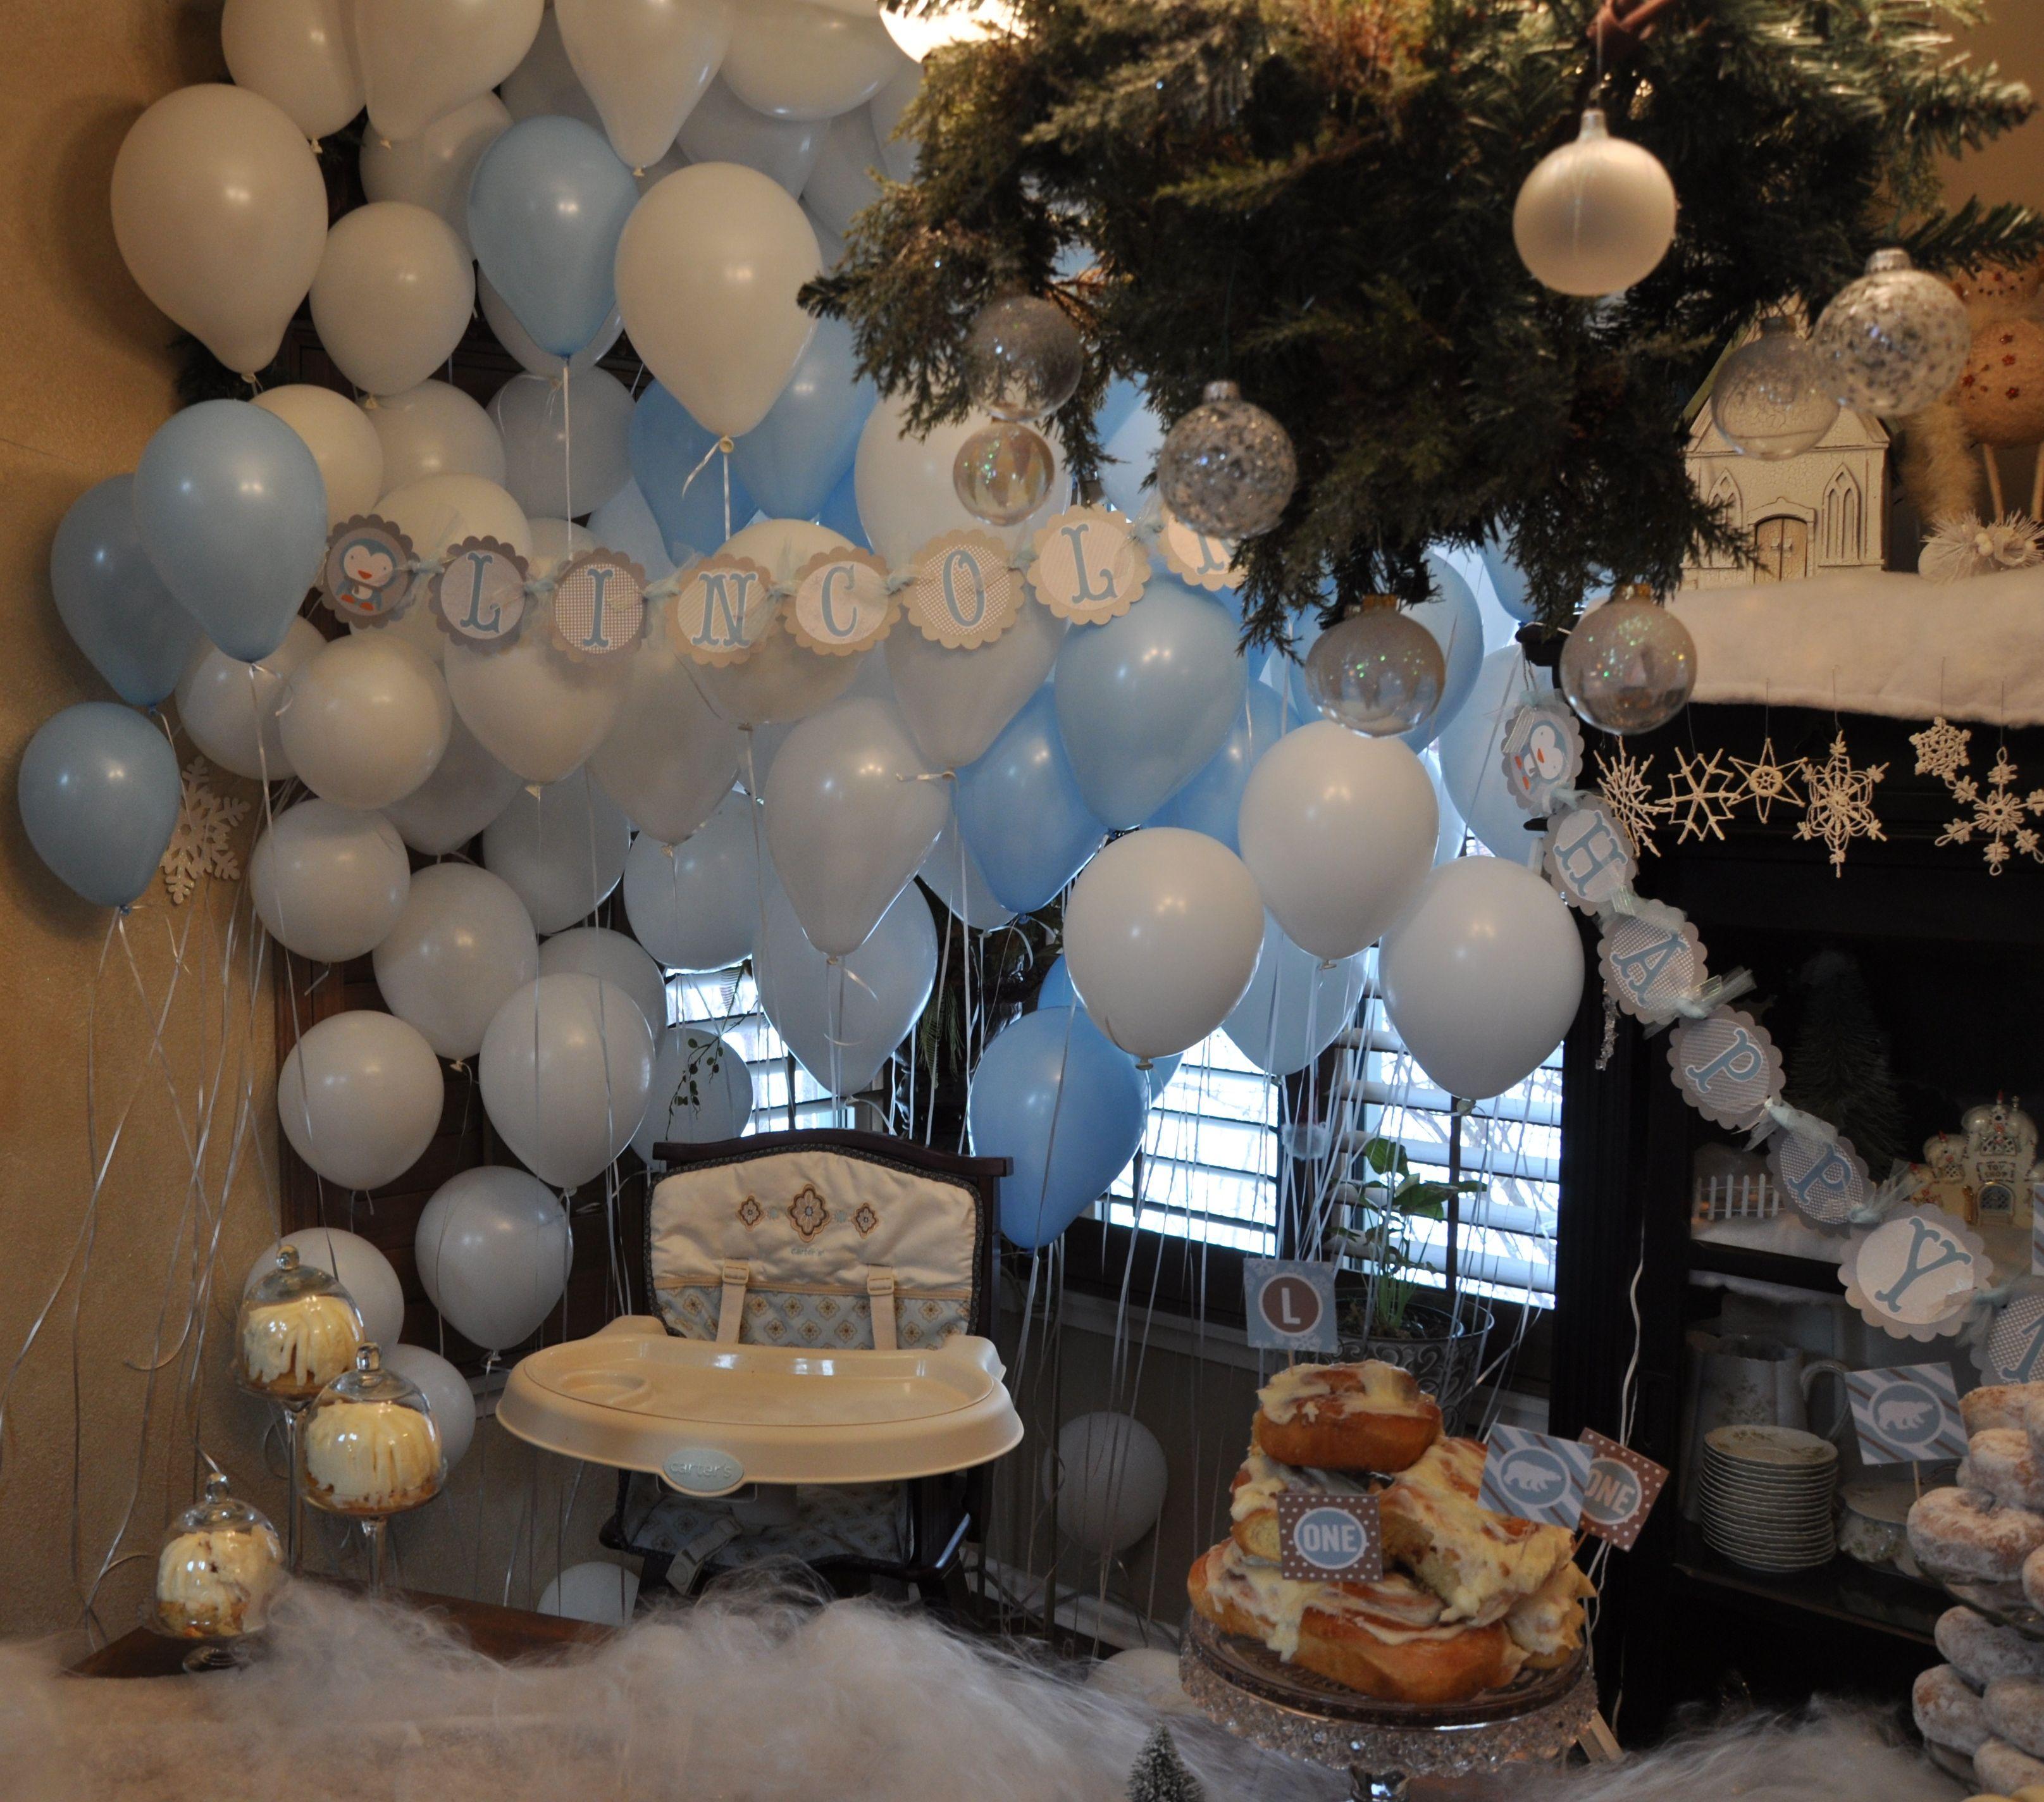 Pin By Elizabeth Edwards On Winter Wonderland Birthday Onederland Birthday Party Winter Birthday Parties Winter Onederland Birthday Party